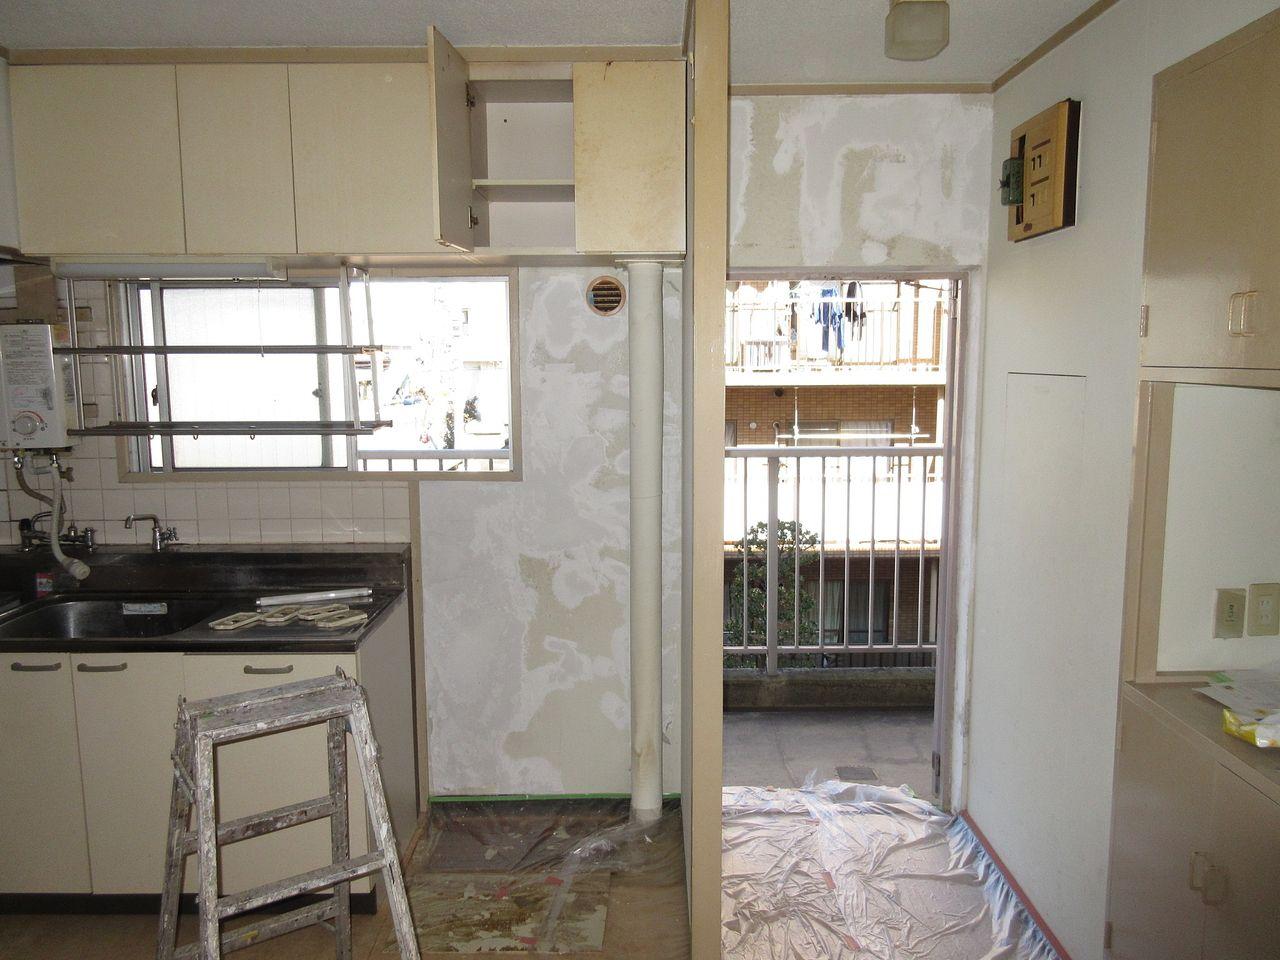 DIY賃貸予定部屋の工事レポート~Vol.2~